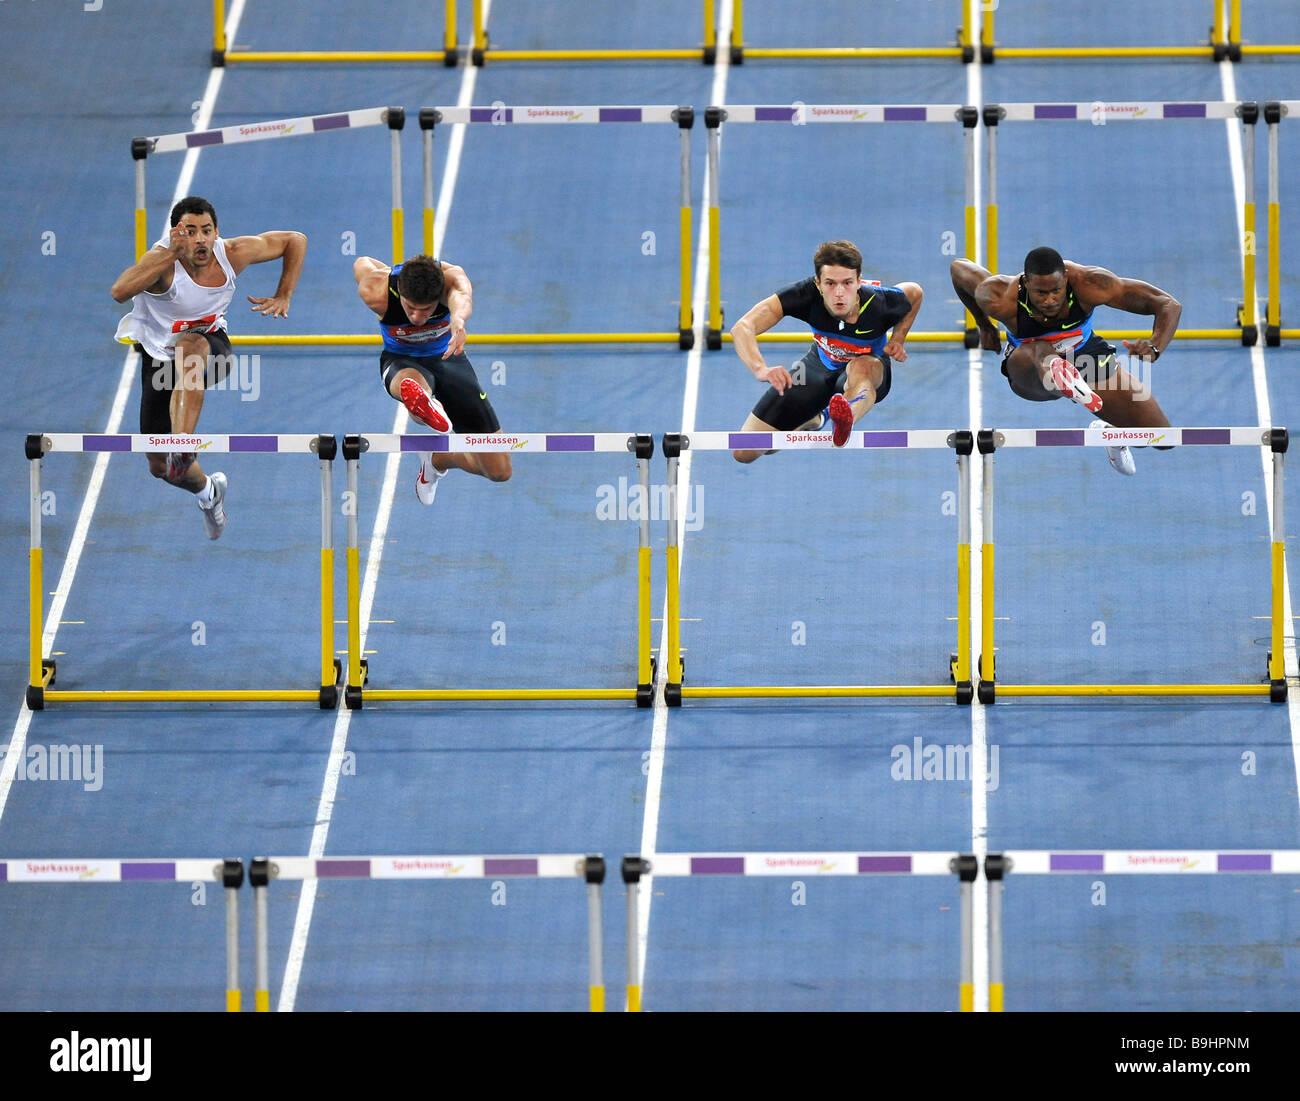 60 m ostacoli, uomini, da sinistra: Darien Garfield FRA, Erik Balnuweit GER, Evgeniy Borisov RUS, David Oiver USA, Immagini Stock